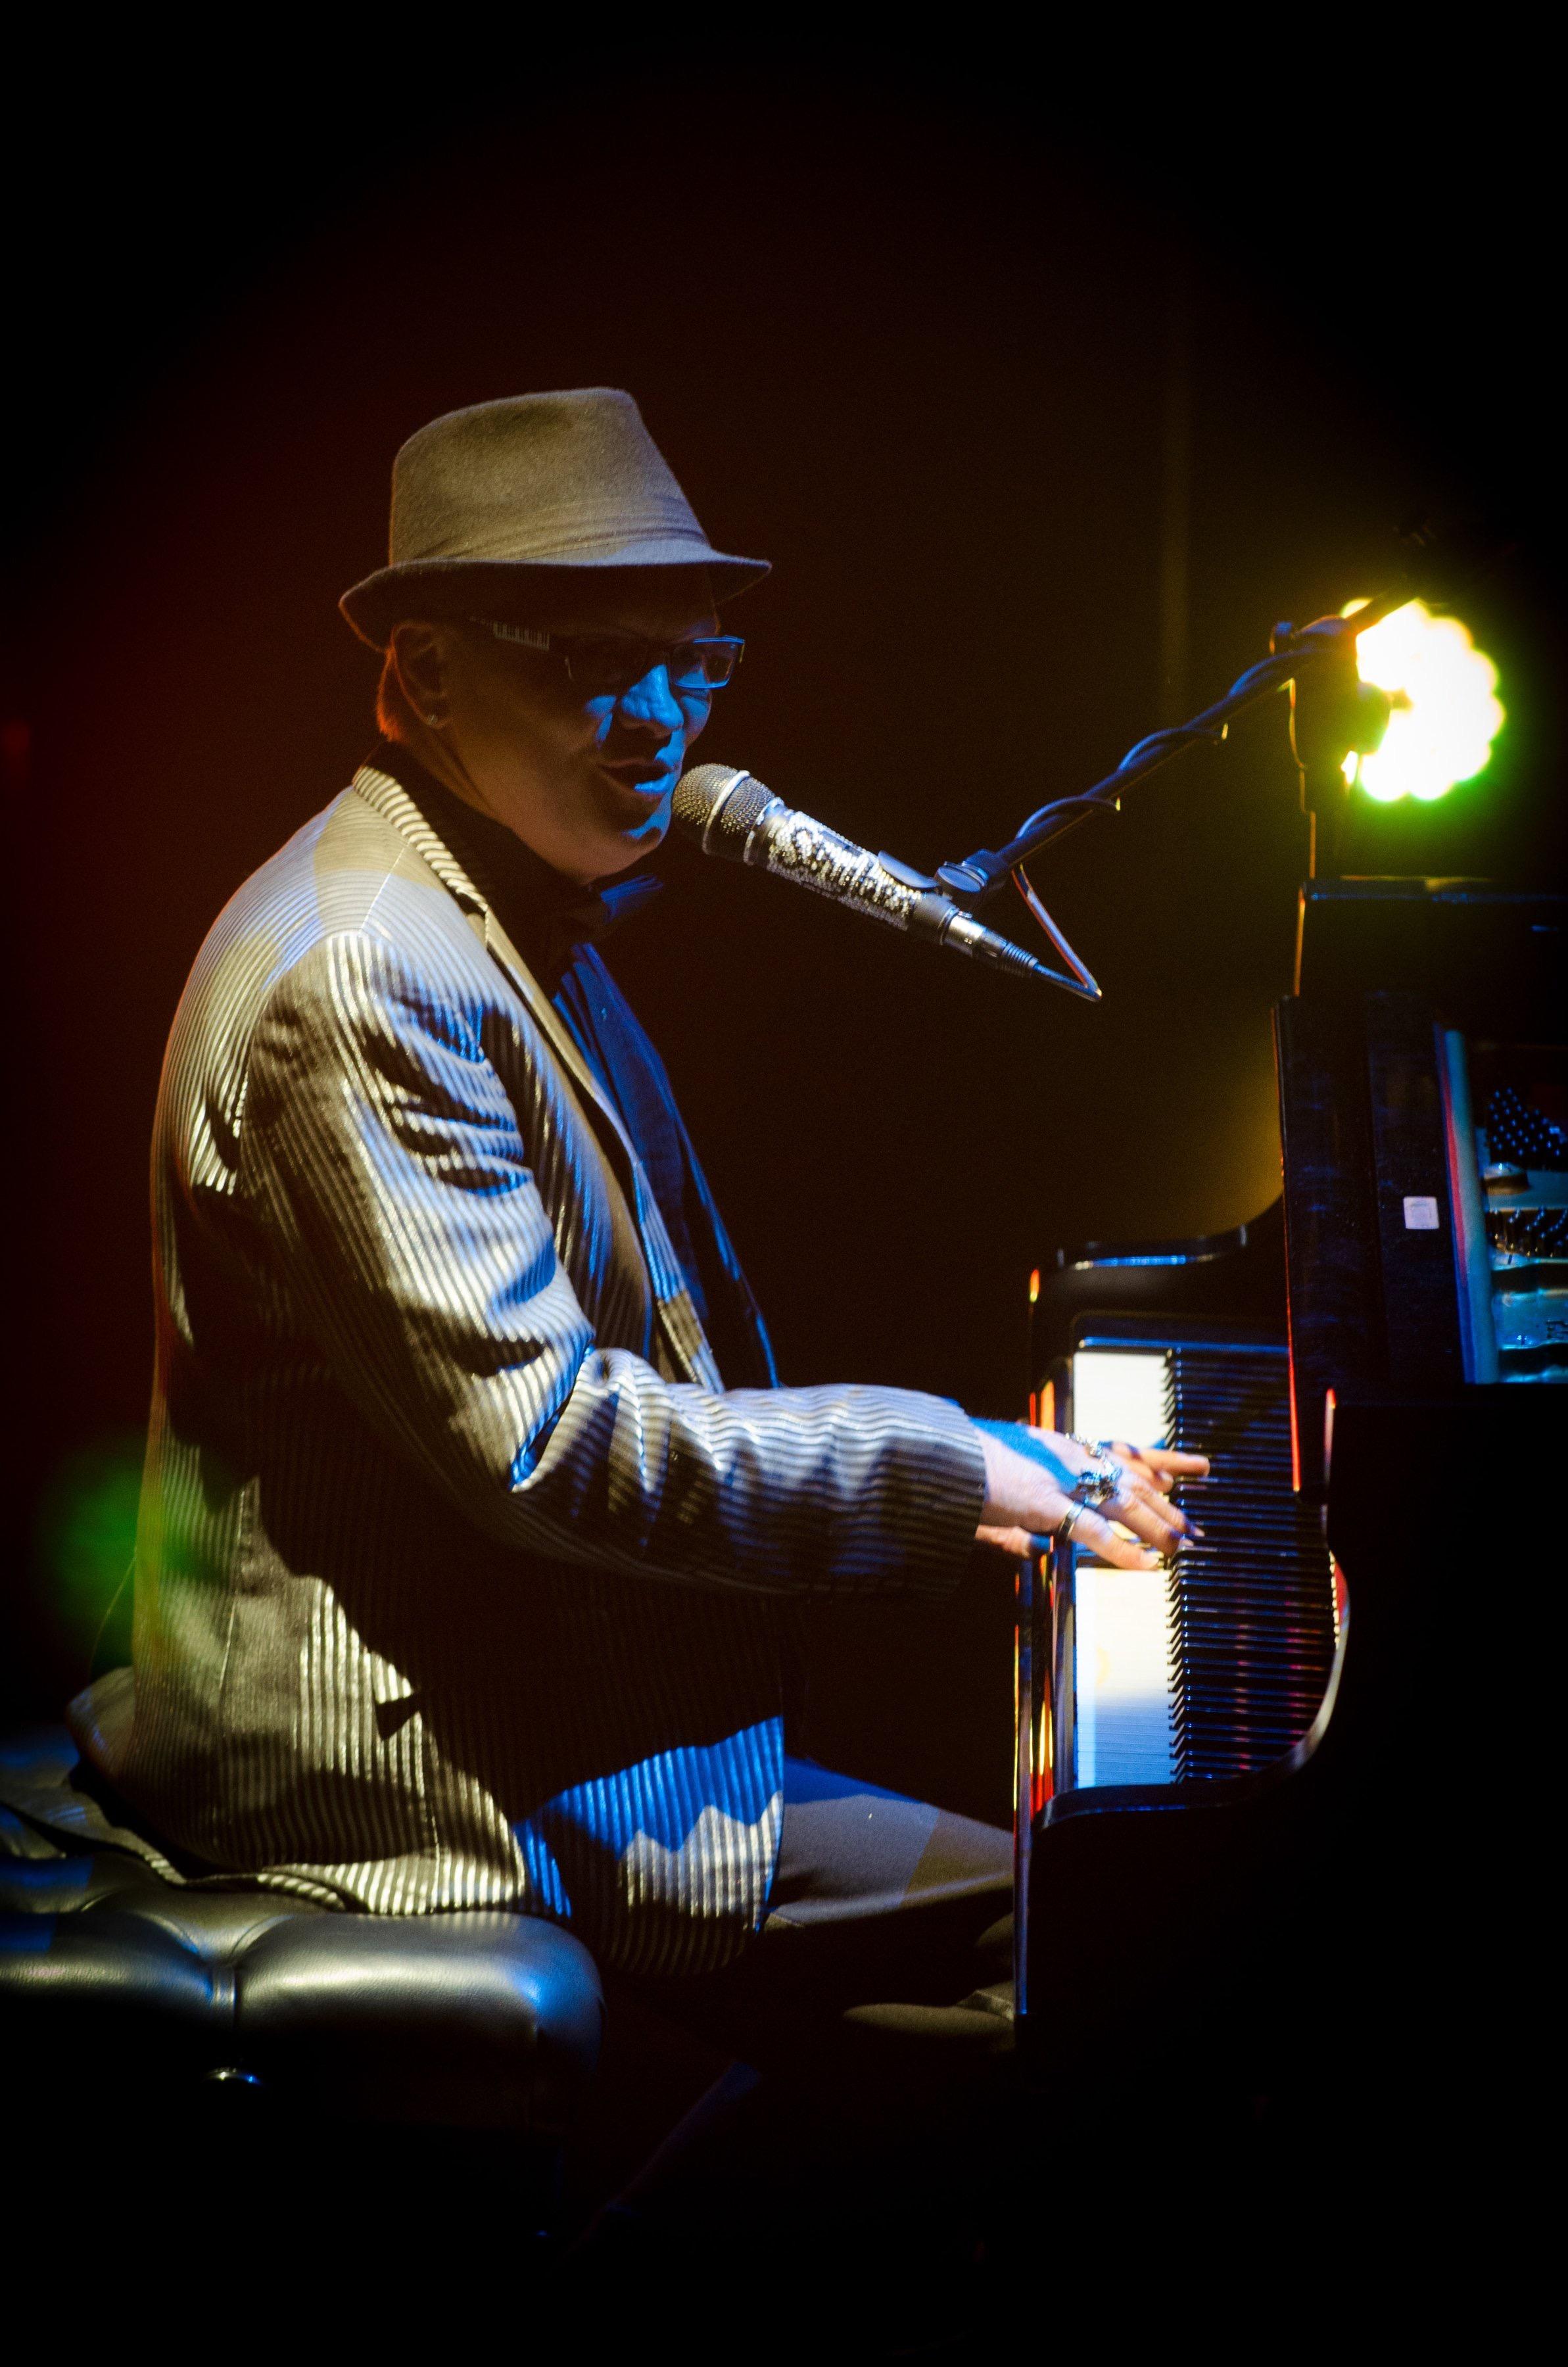 POP UP PIANO BAR - Tuesdays thru Sundays 6pm to 10pm OPEN RUN